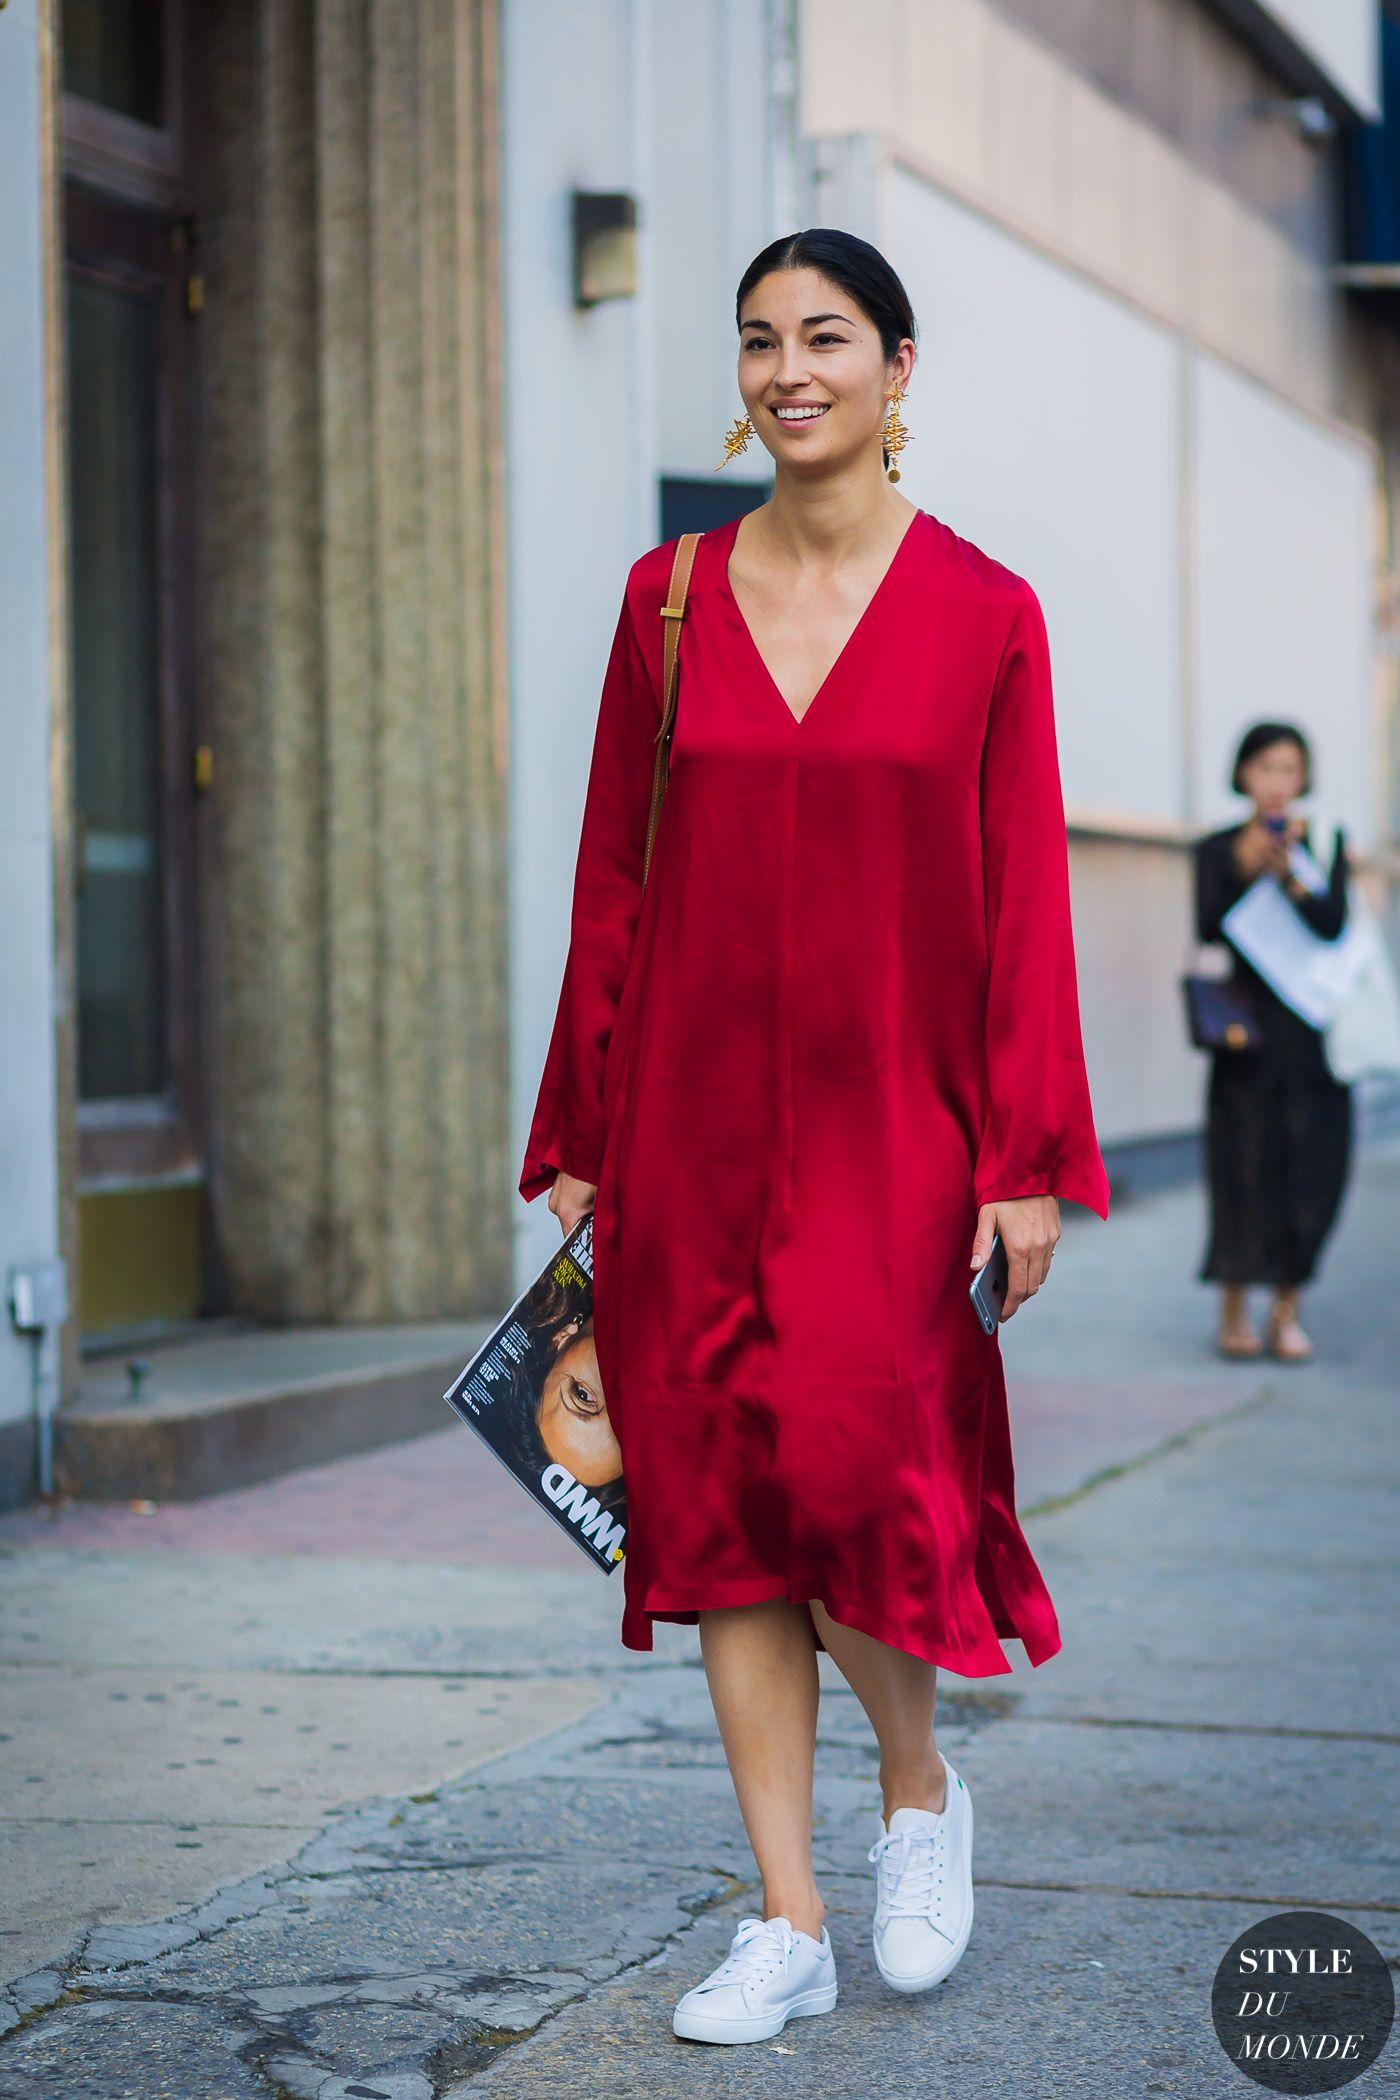 New York SS 2017 Street Style: Caroline Issa